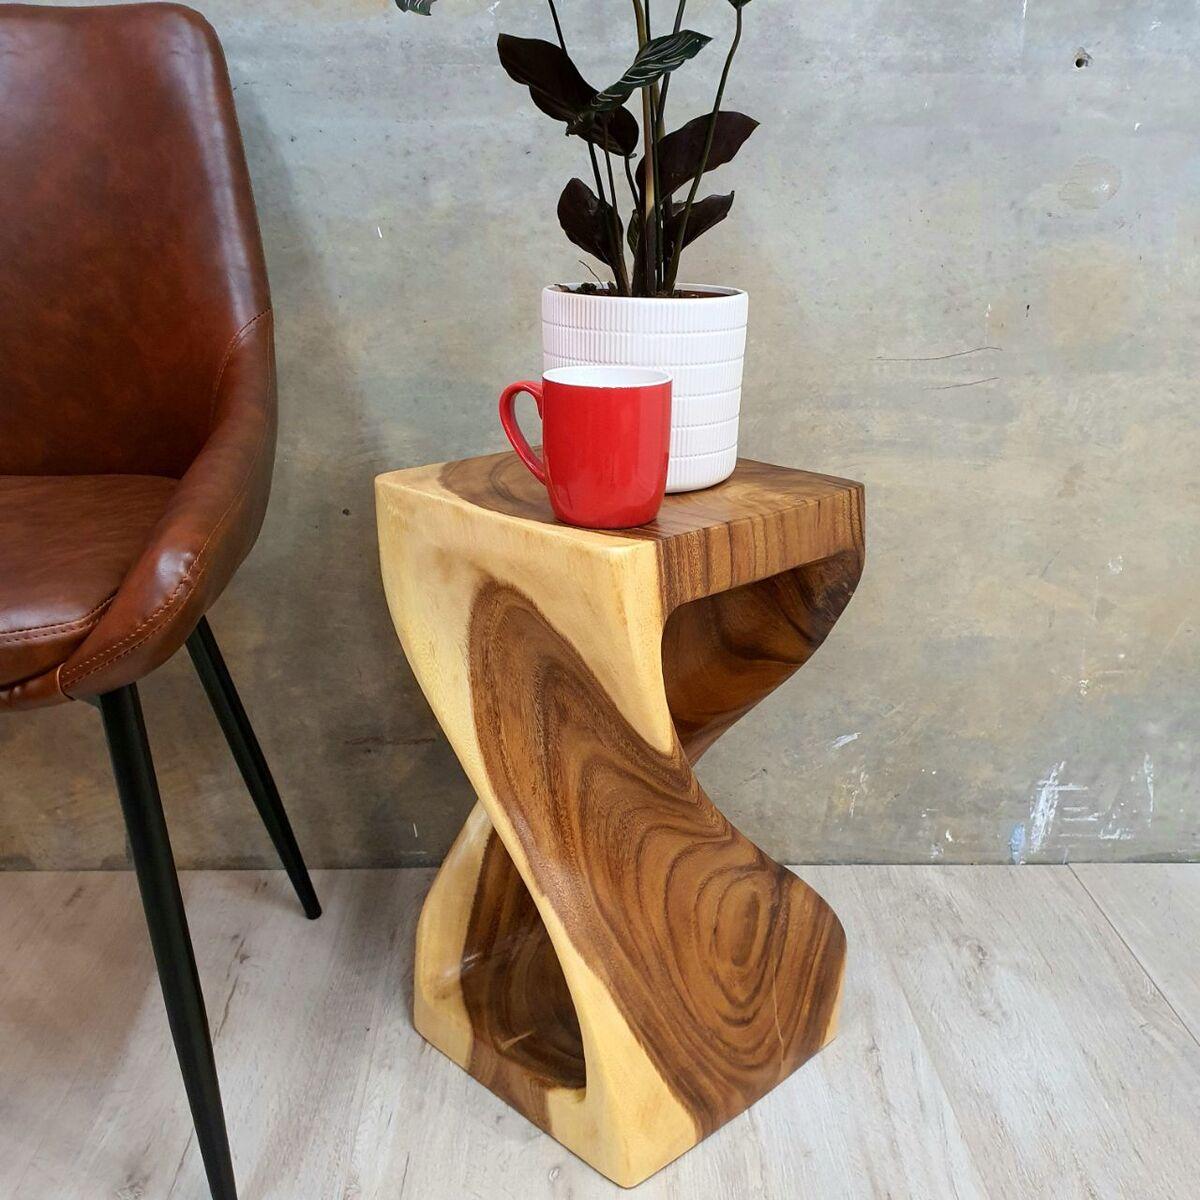 Raintree Wood Corner Table Side Table Indoor Outdoor Plant Stand Live Edge